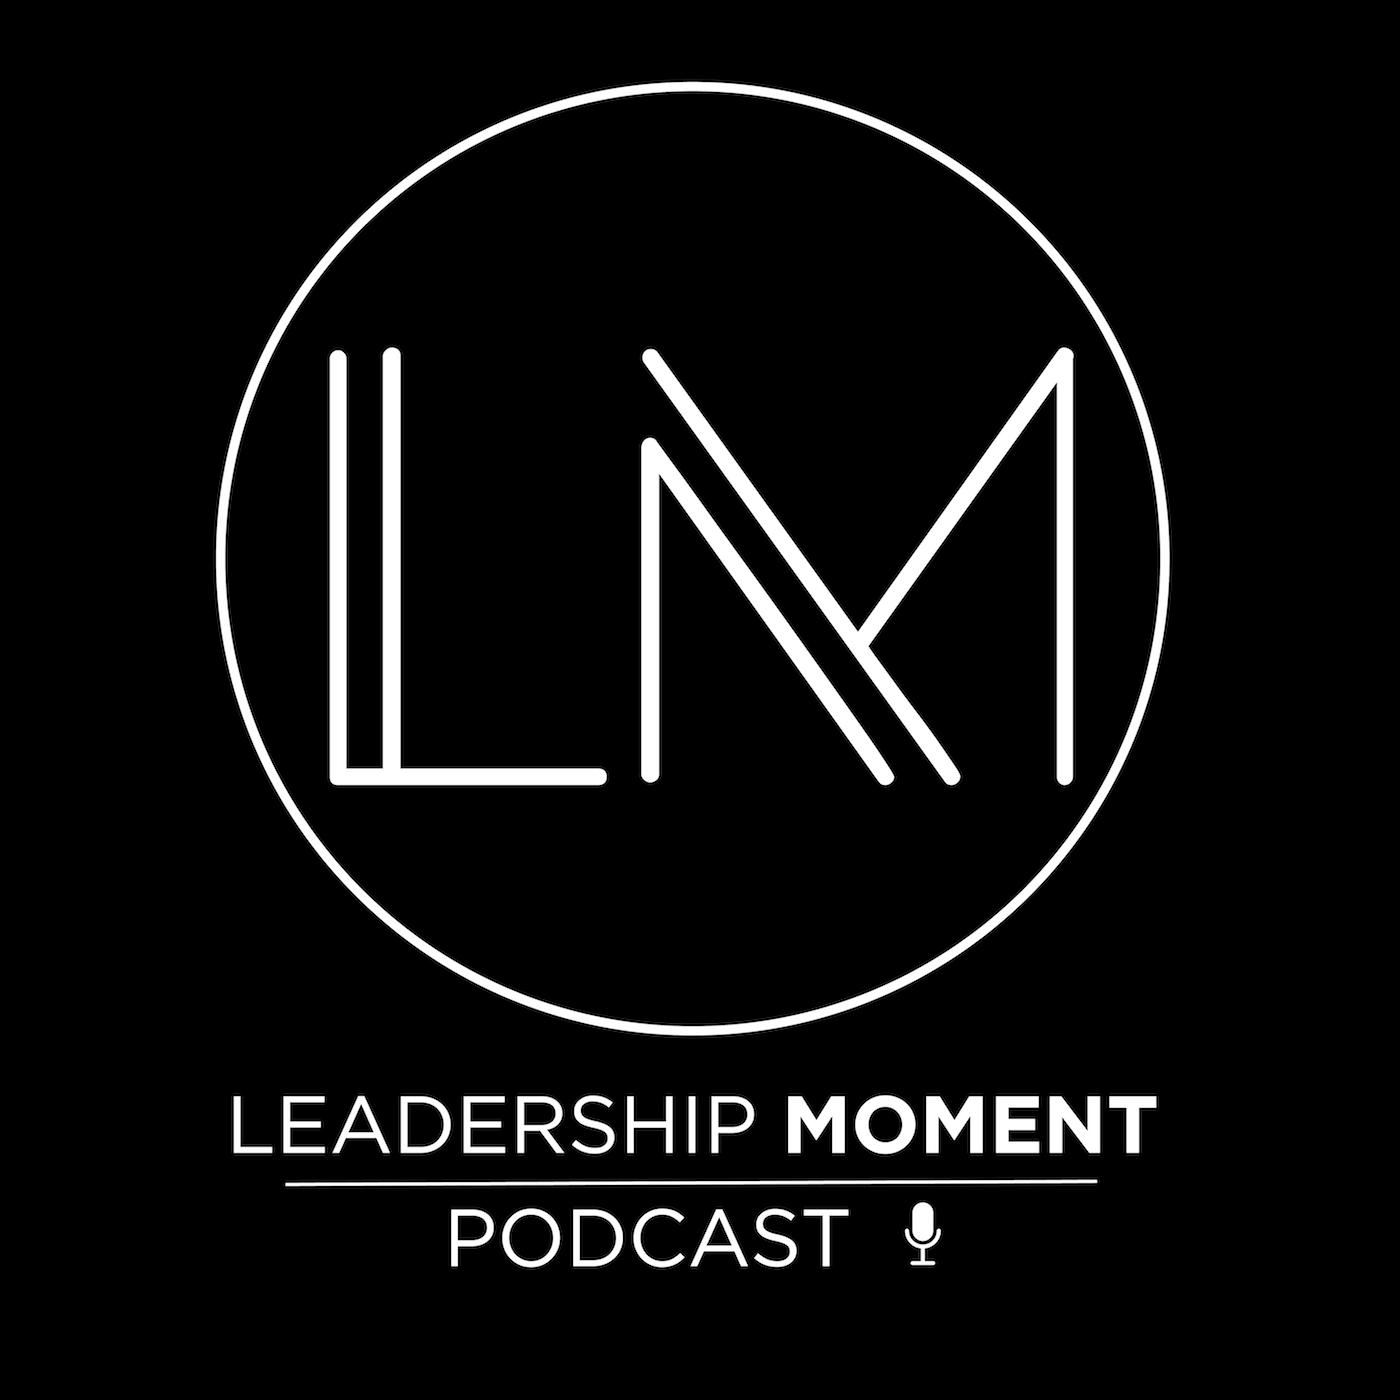 Leaders: Don't Misunderstand Transformational Leadership - LM0216